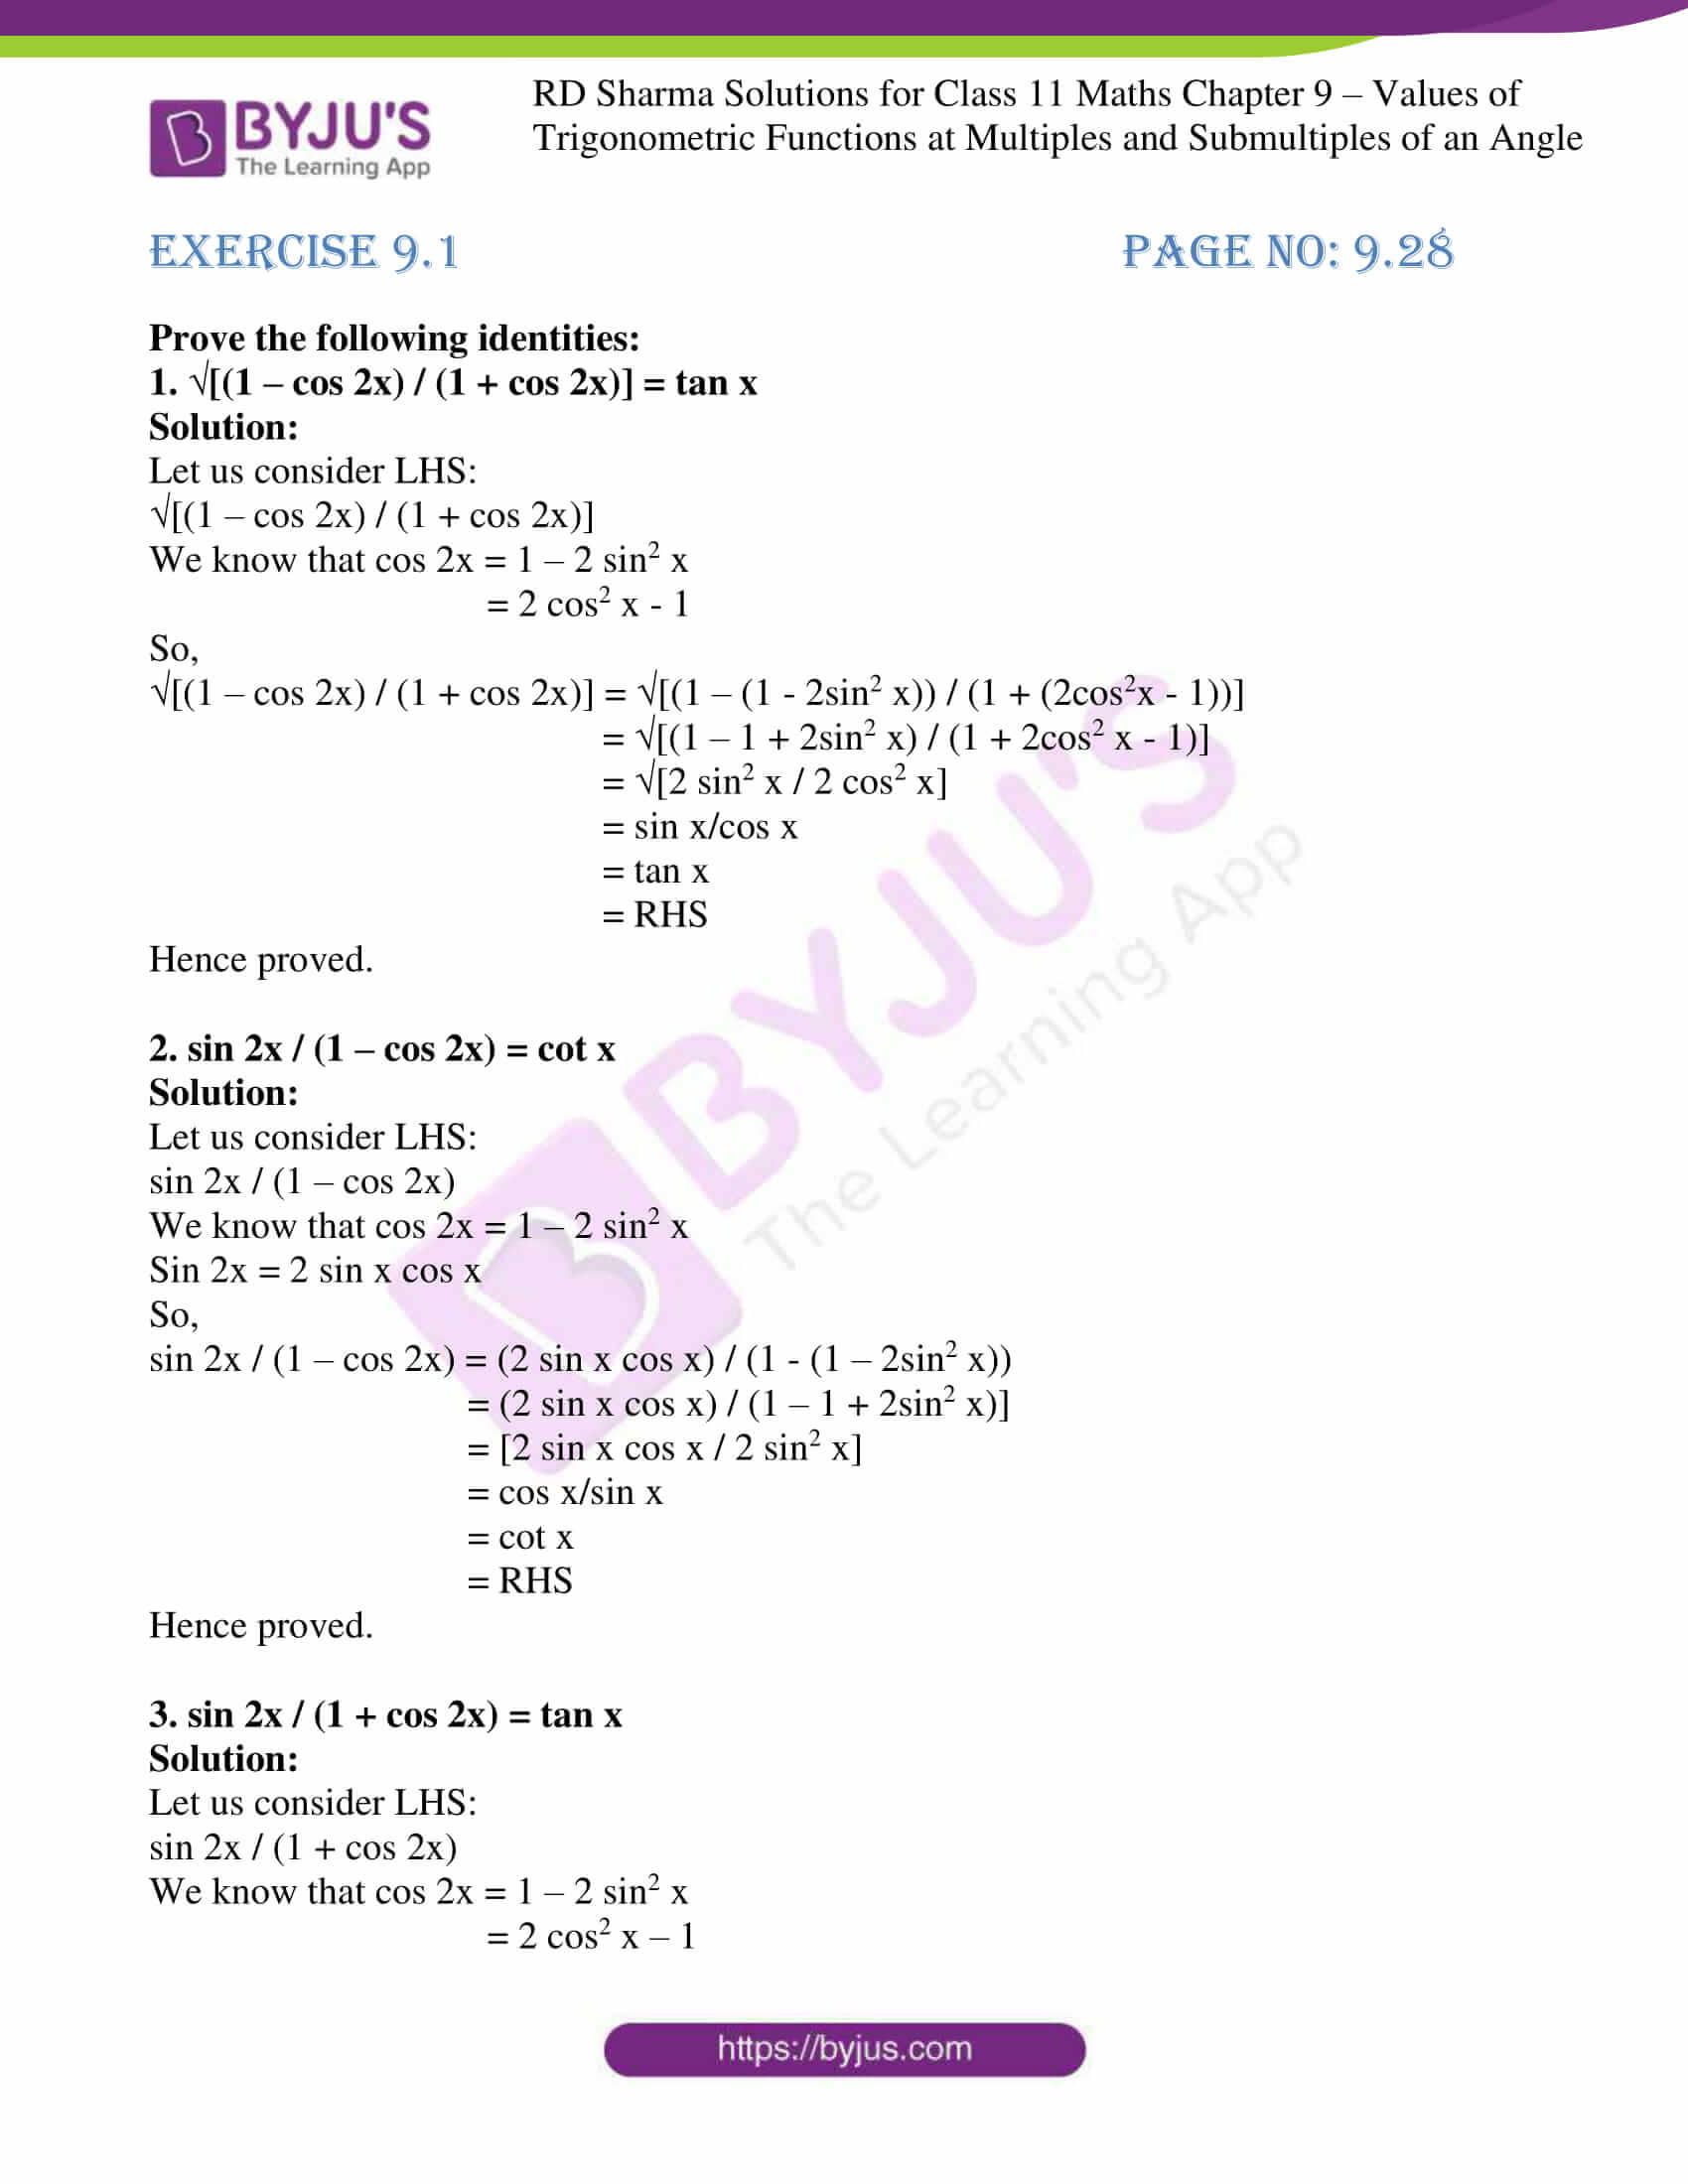 rd sharma class 11 maths ch 9 ex 1 01